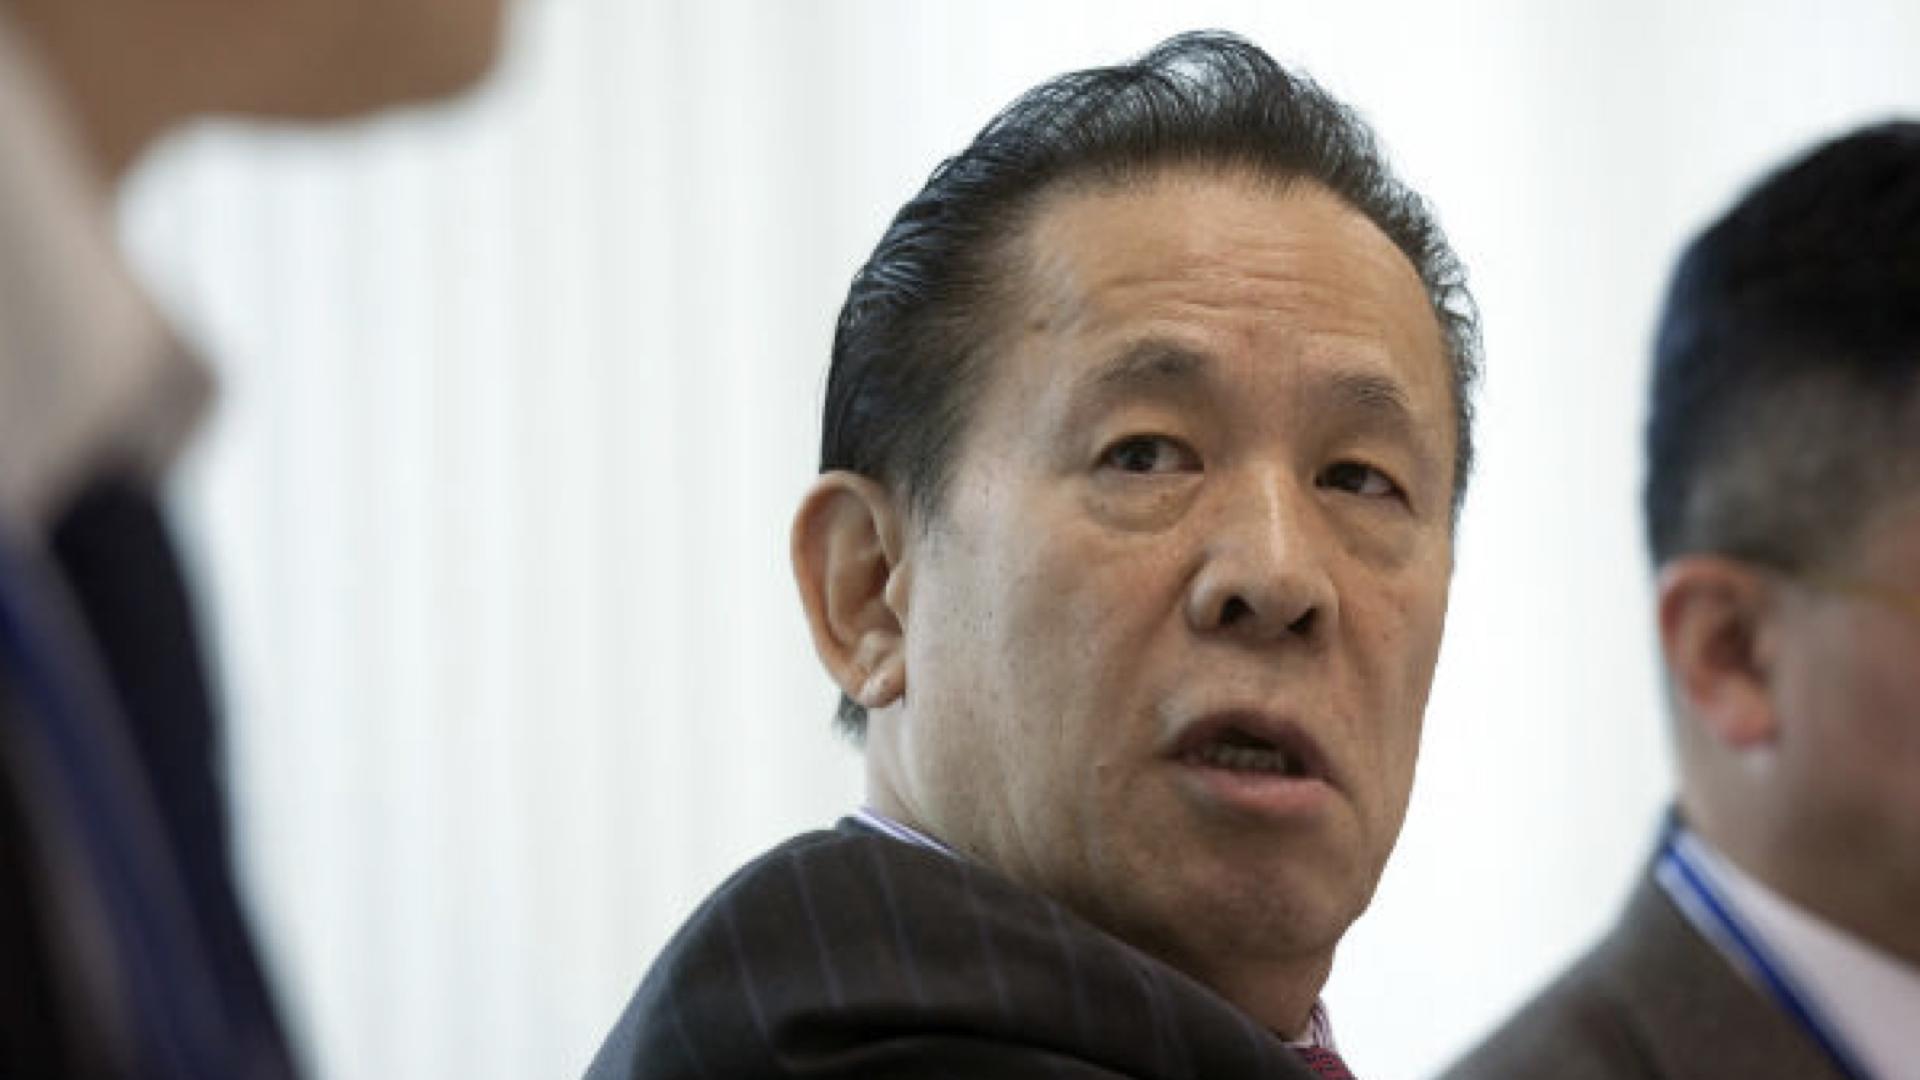 Kazuo Okada's appeal against Universal Entertainment dismissed